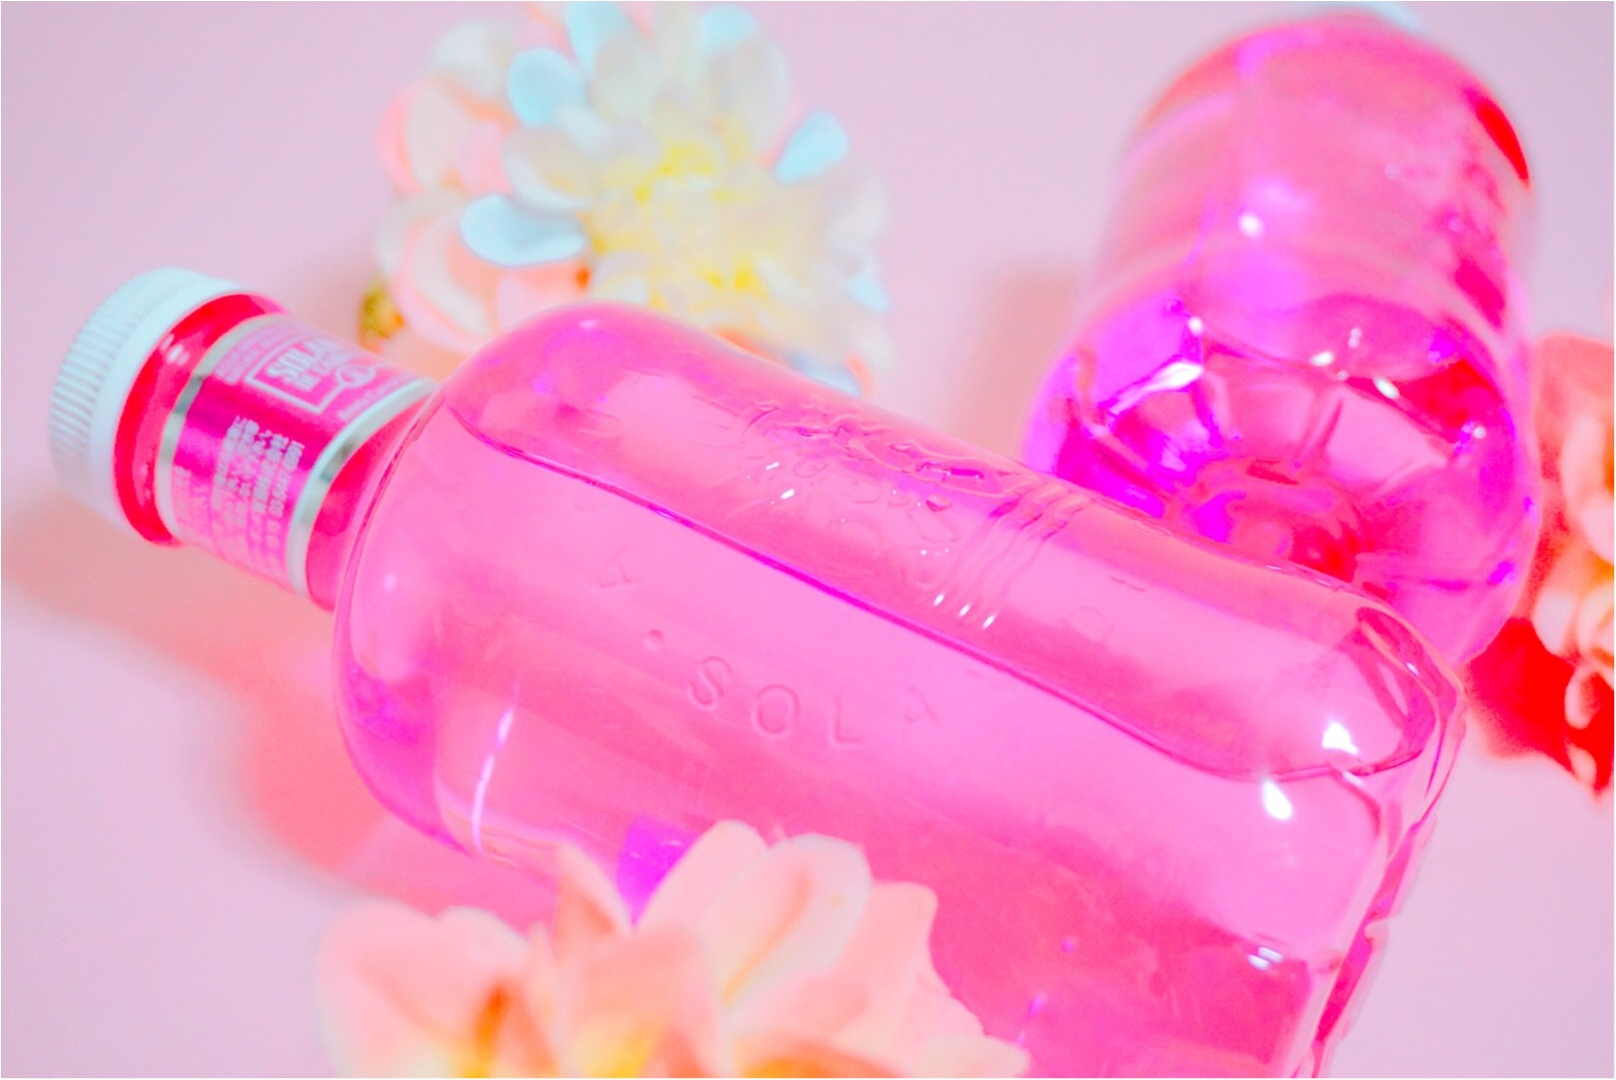 《SNSで話題沸騰中‼︎》噂の【ピンクの水】ソラン・デ・カブラスの限定ピンクボトルが可愛すぎる♡_3